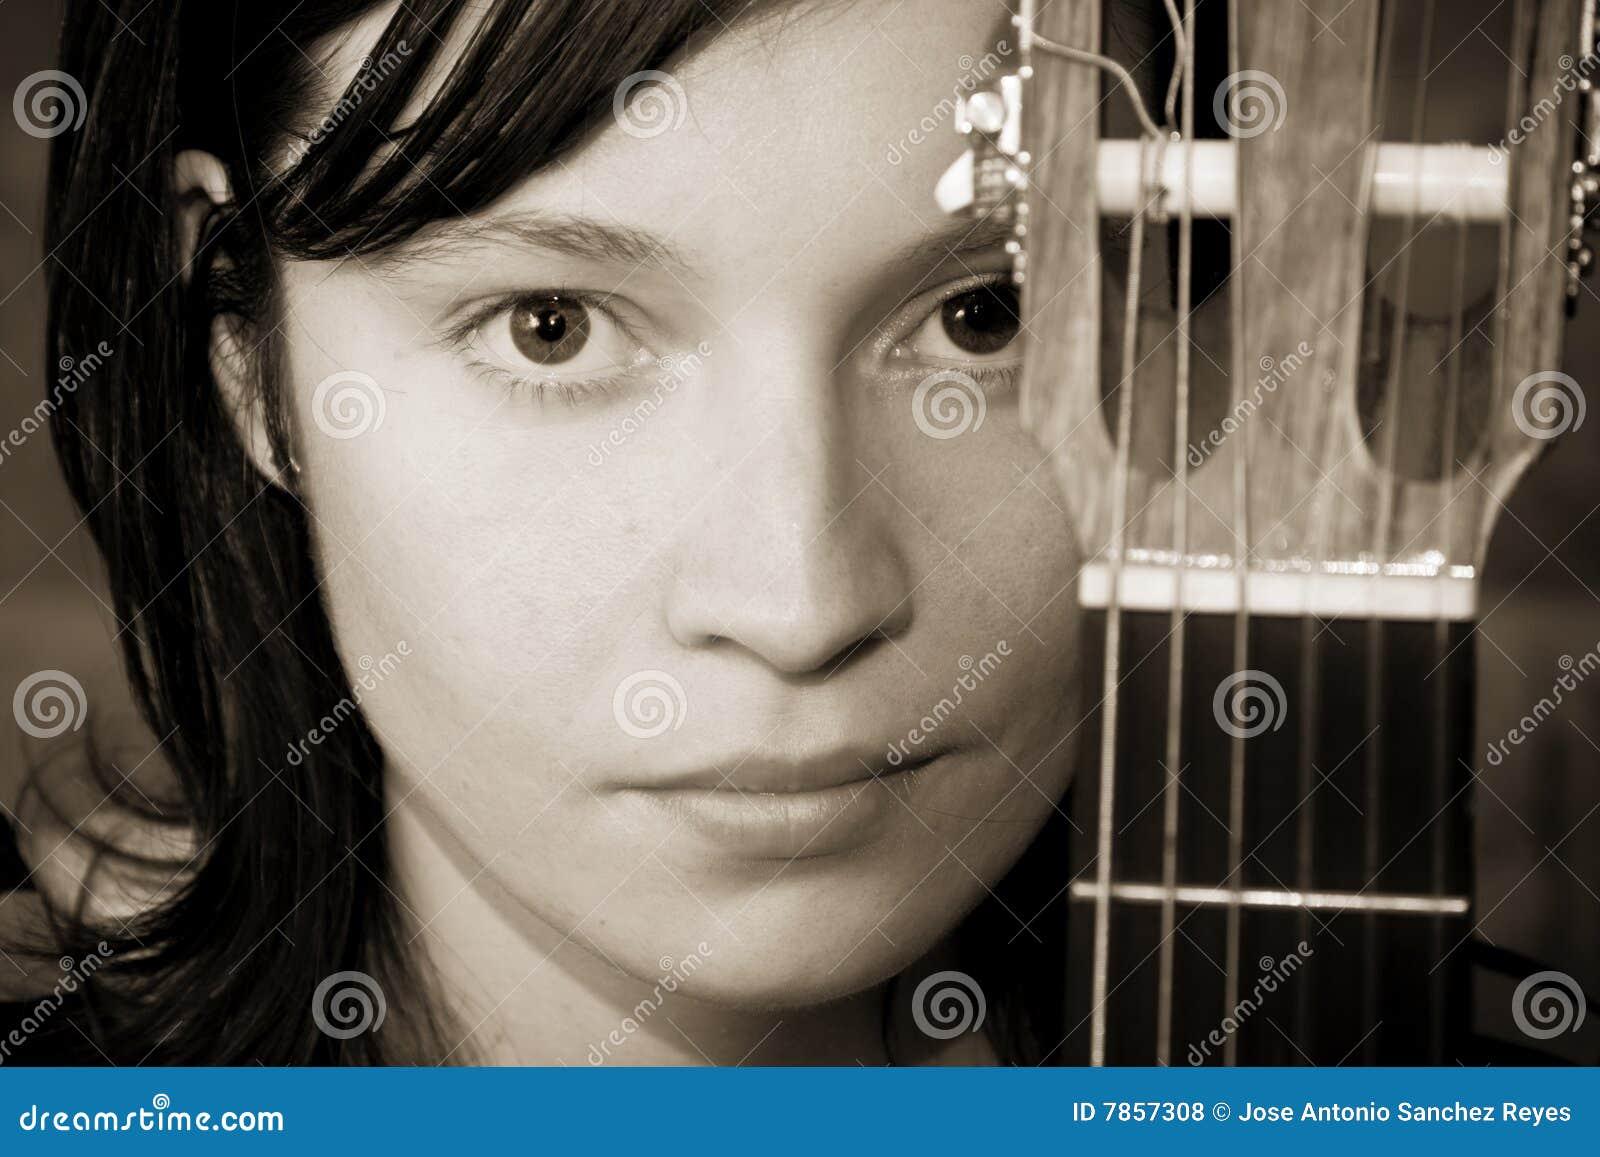 Woman behind fretboard